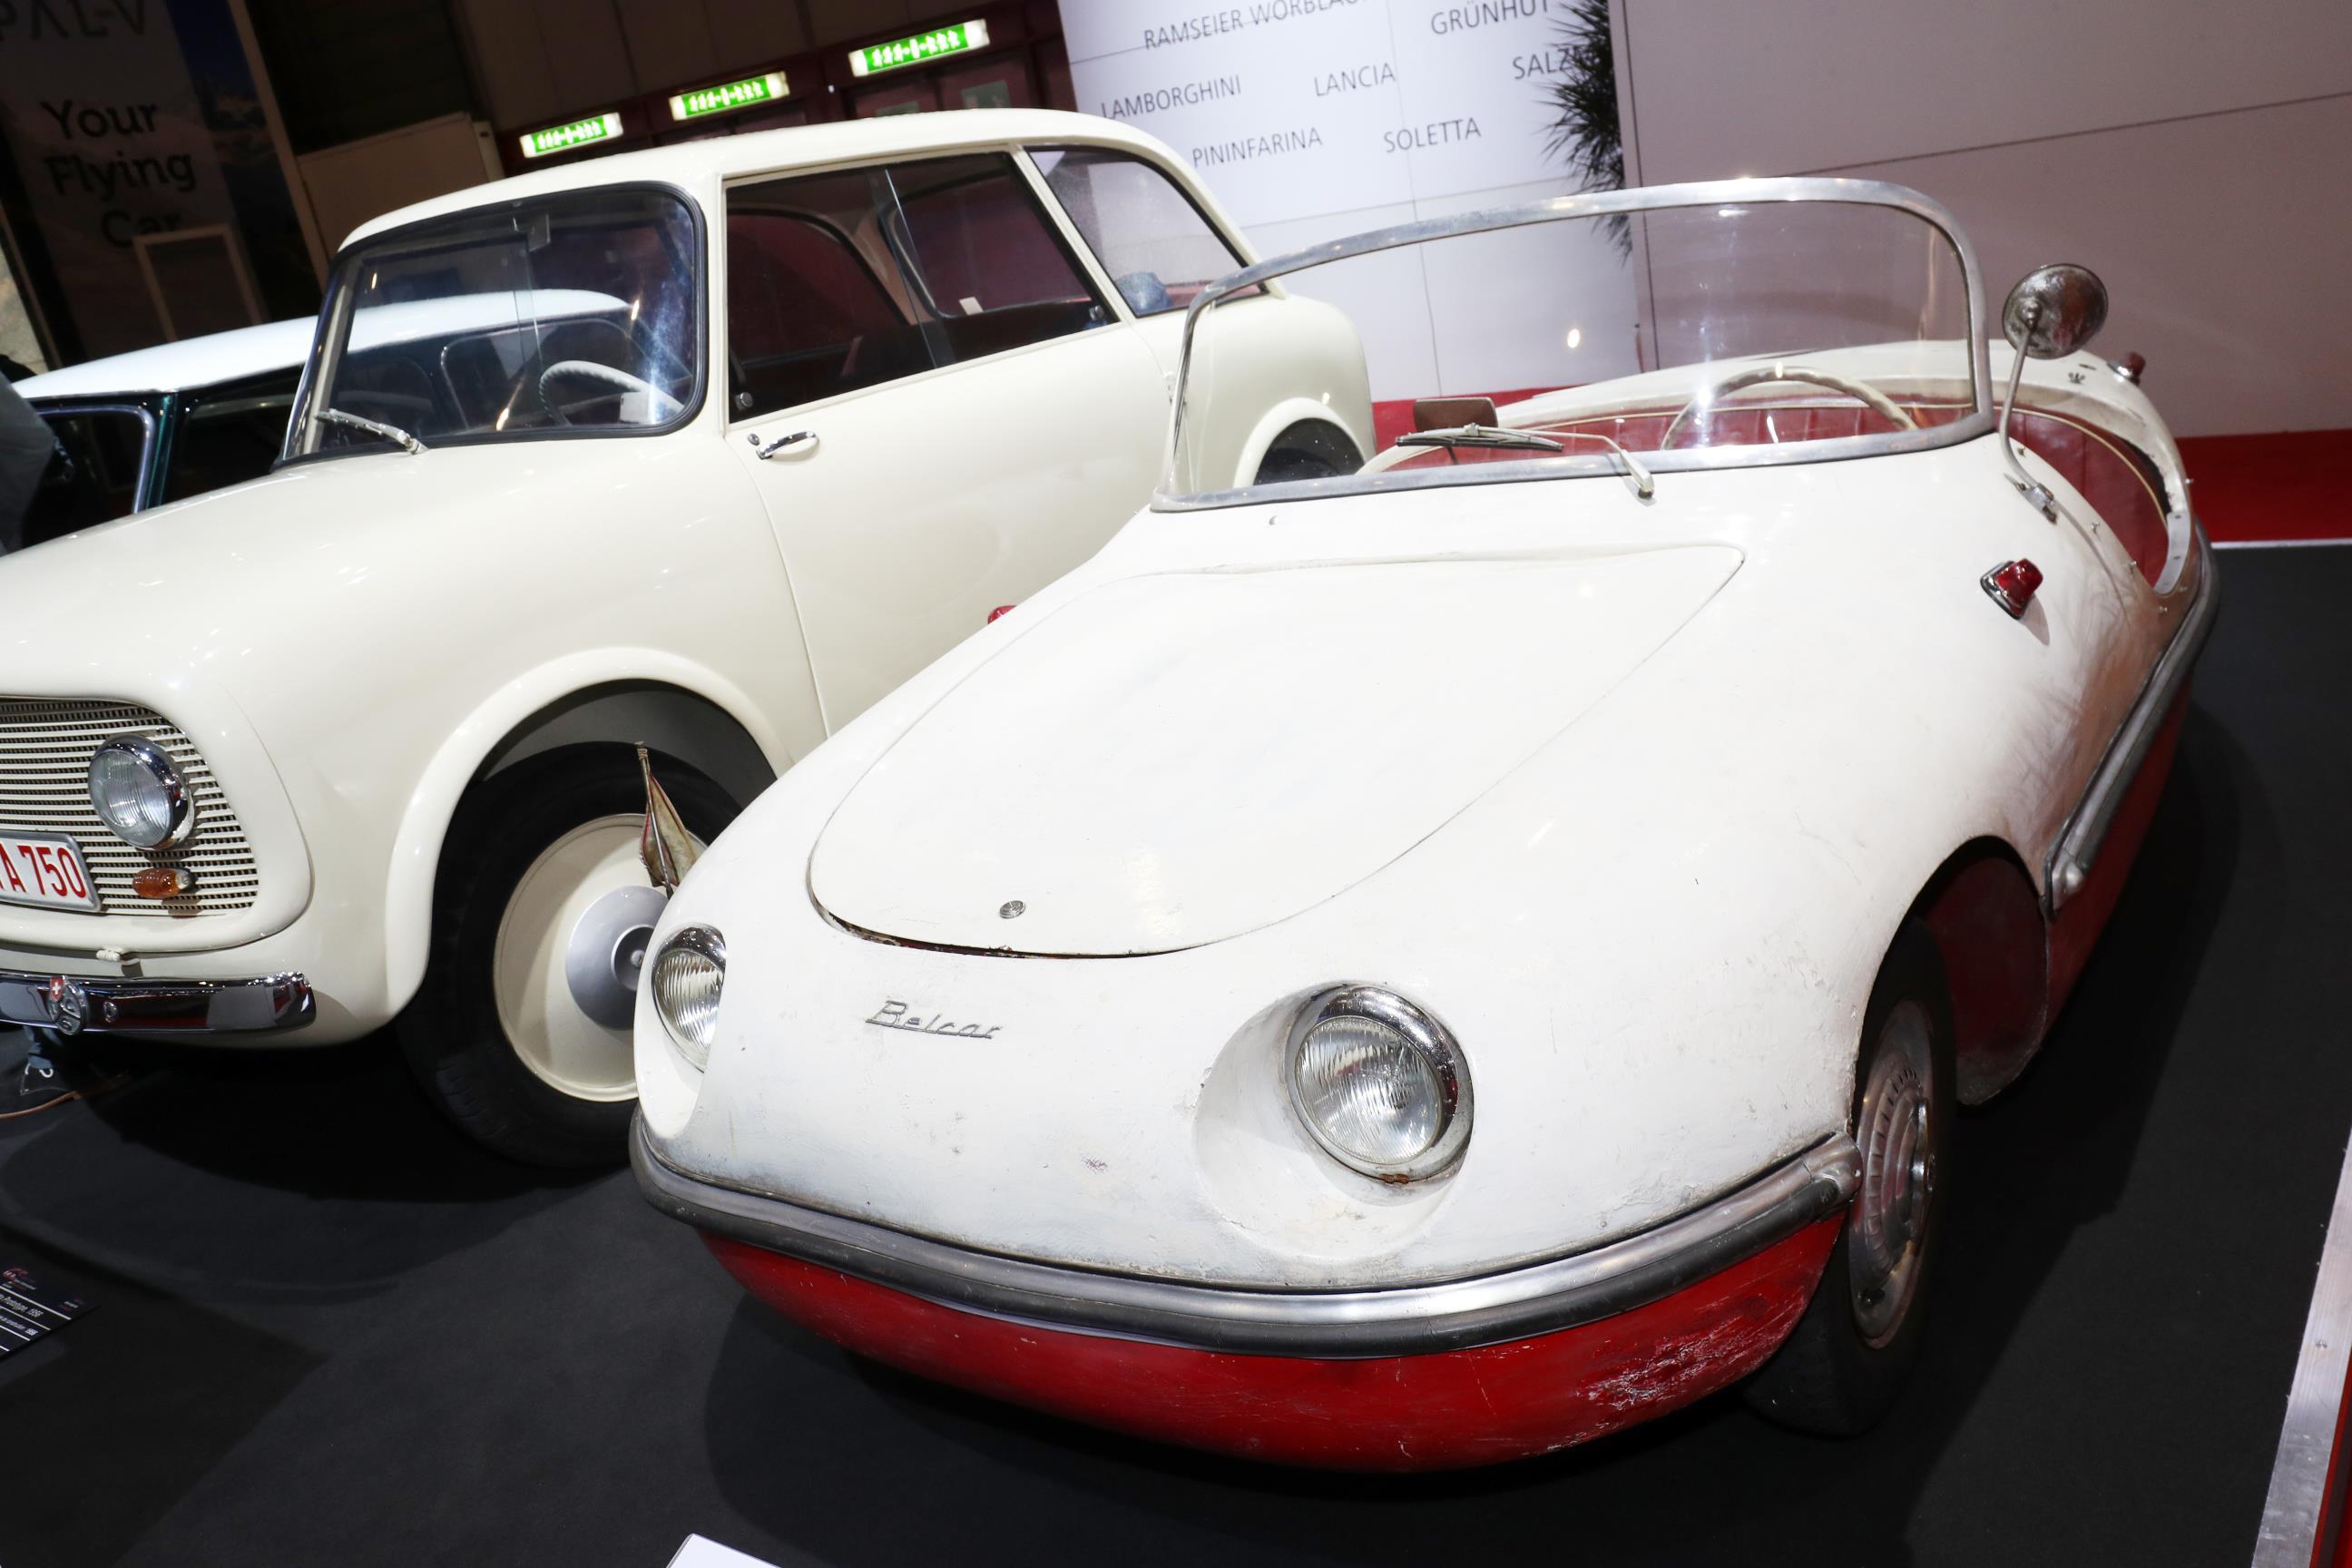 Geneva Motor Show 2018 Mega Gallery Part 2 (413)